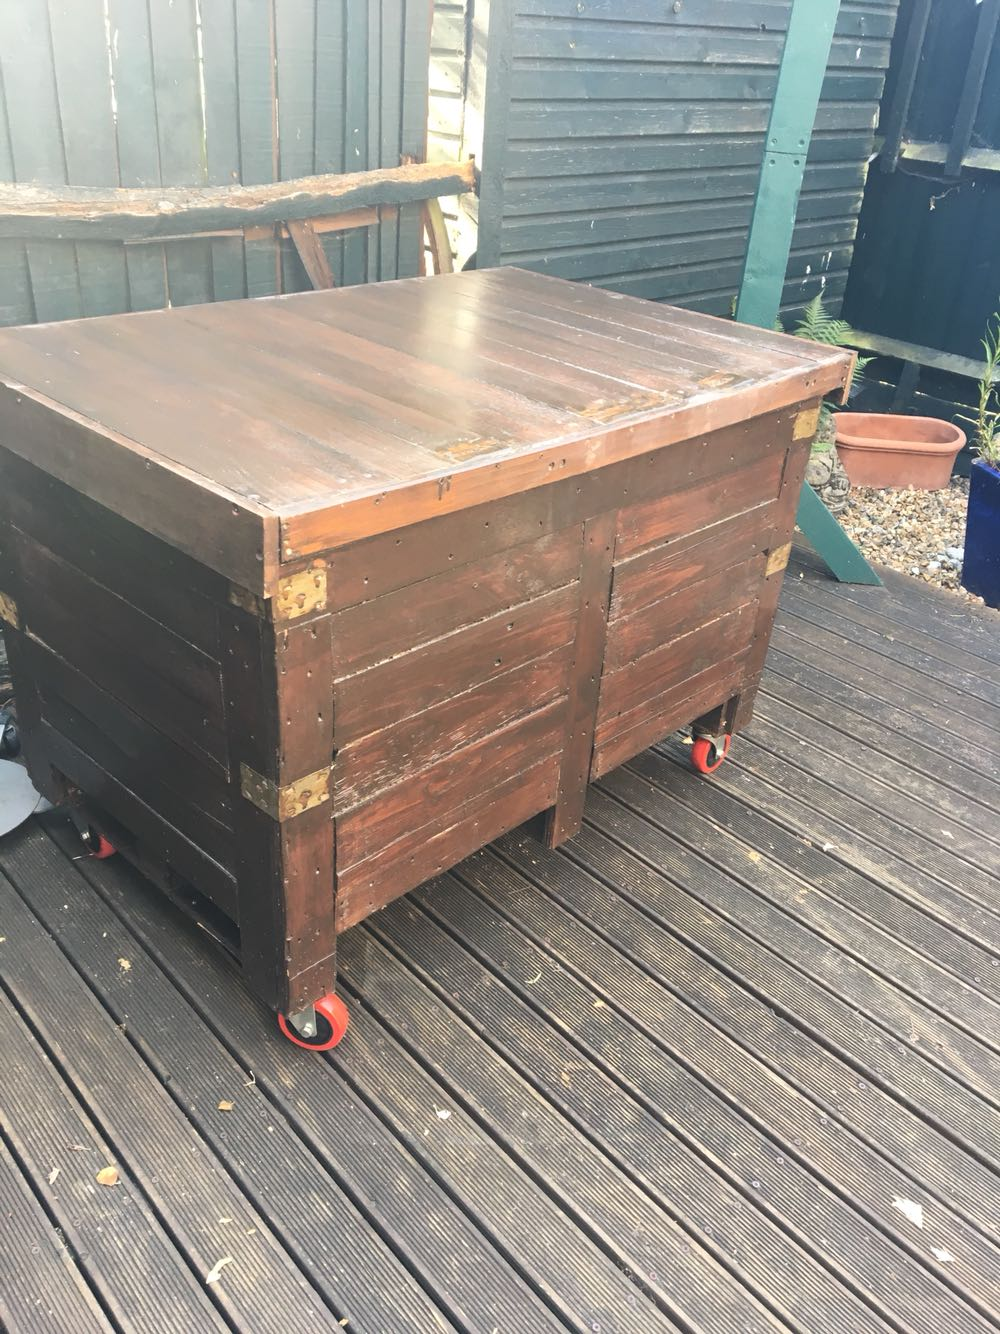 wooden garden furniture - Second Hand Garden Furniture Buy and